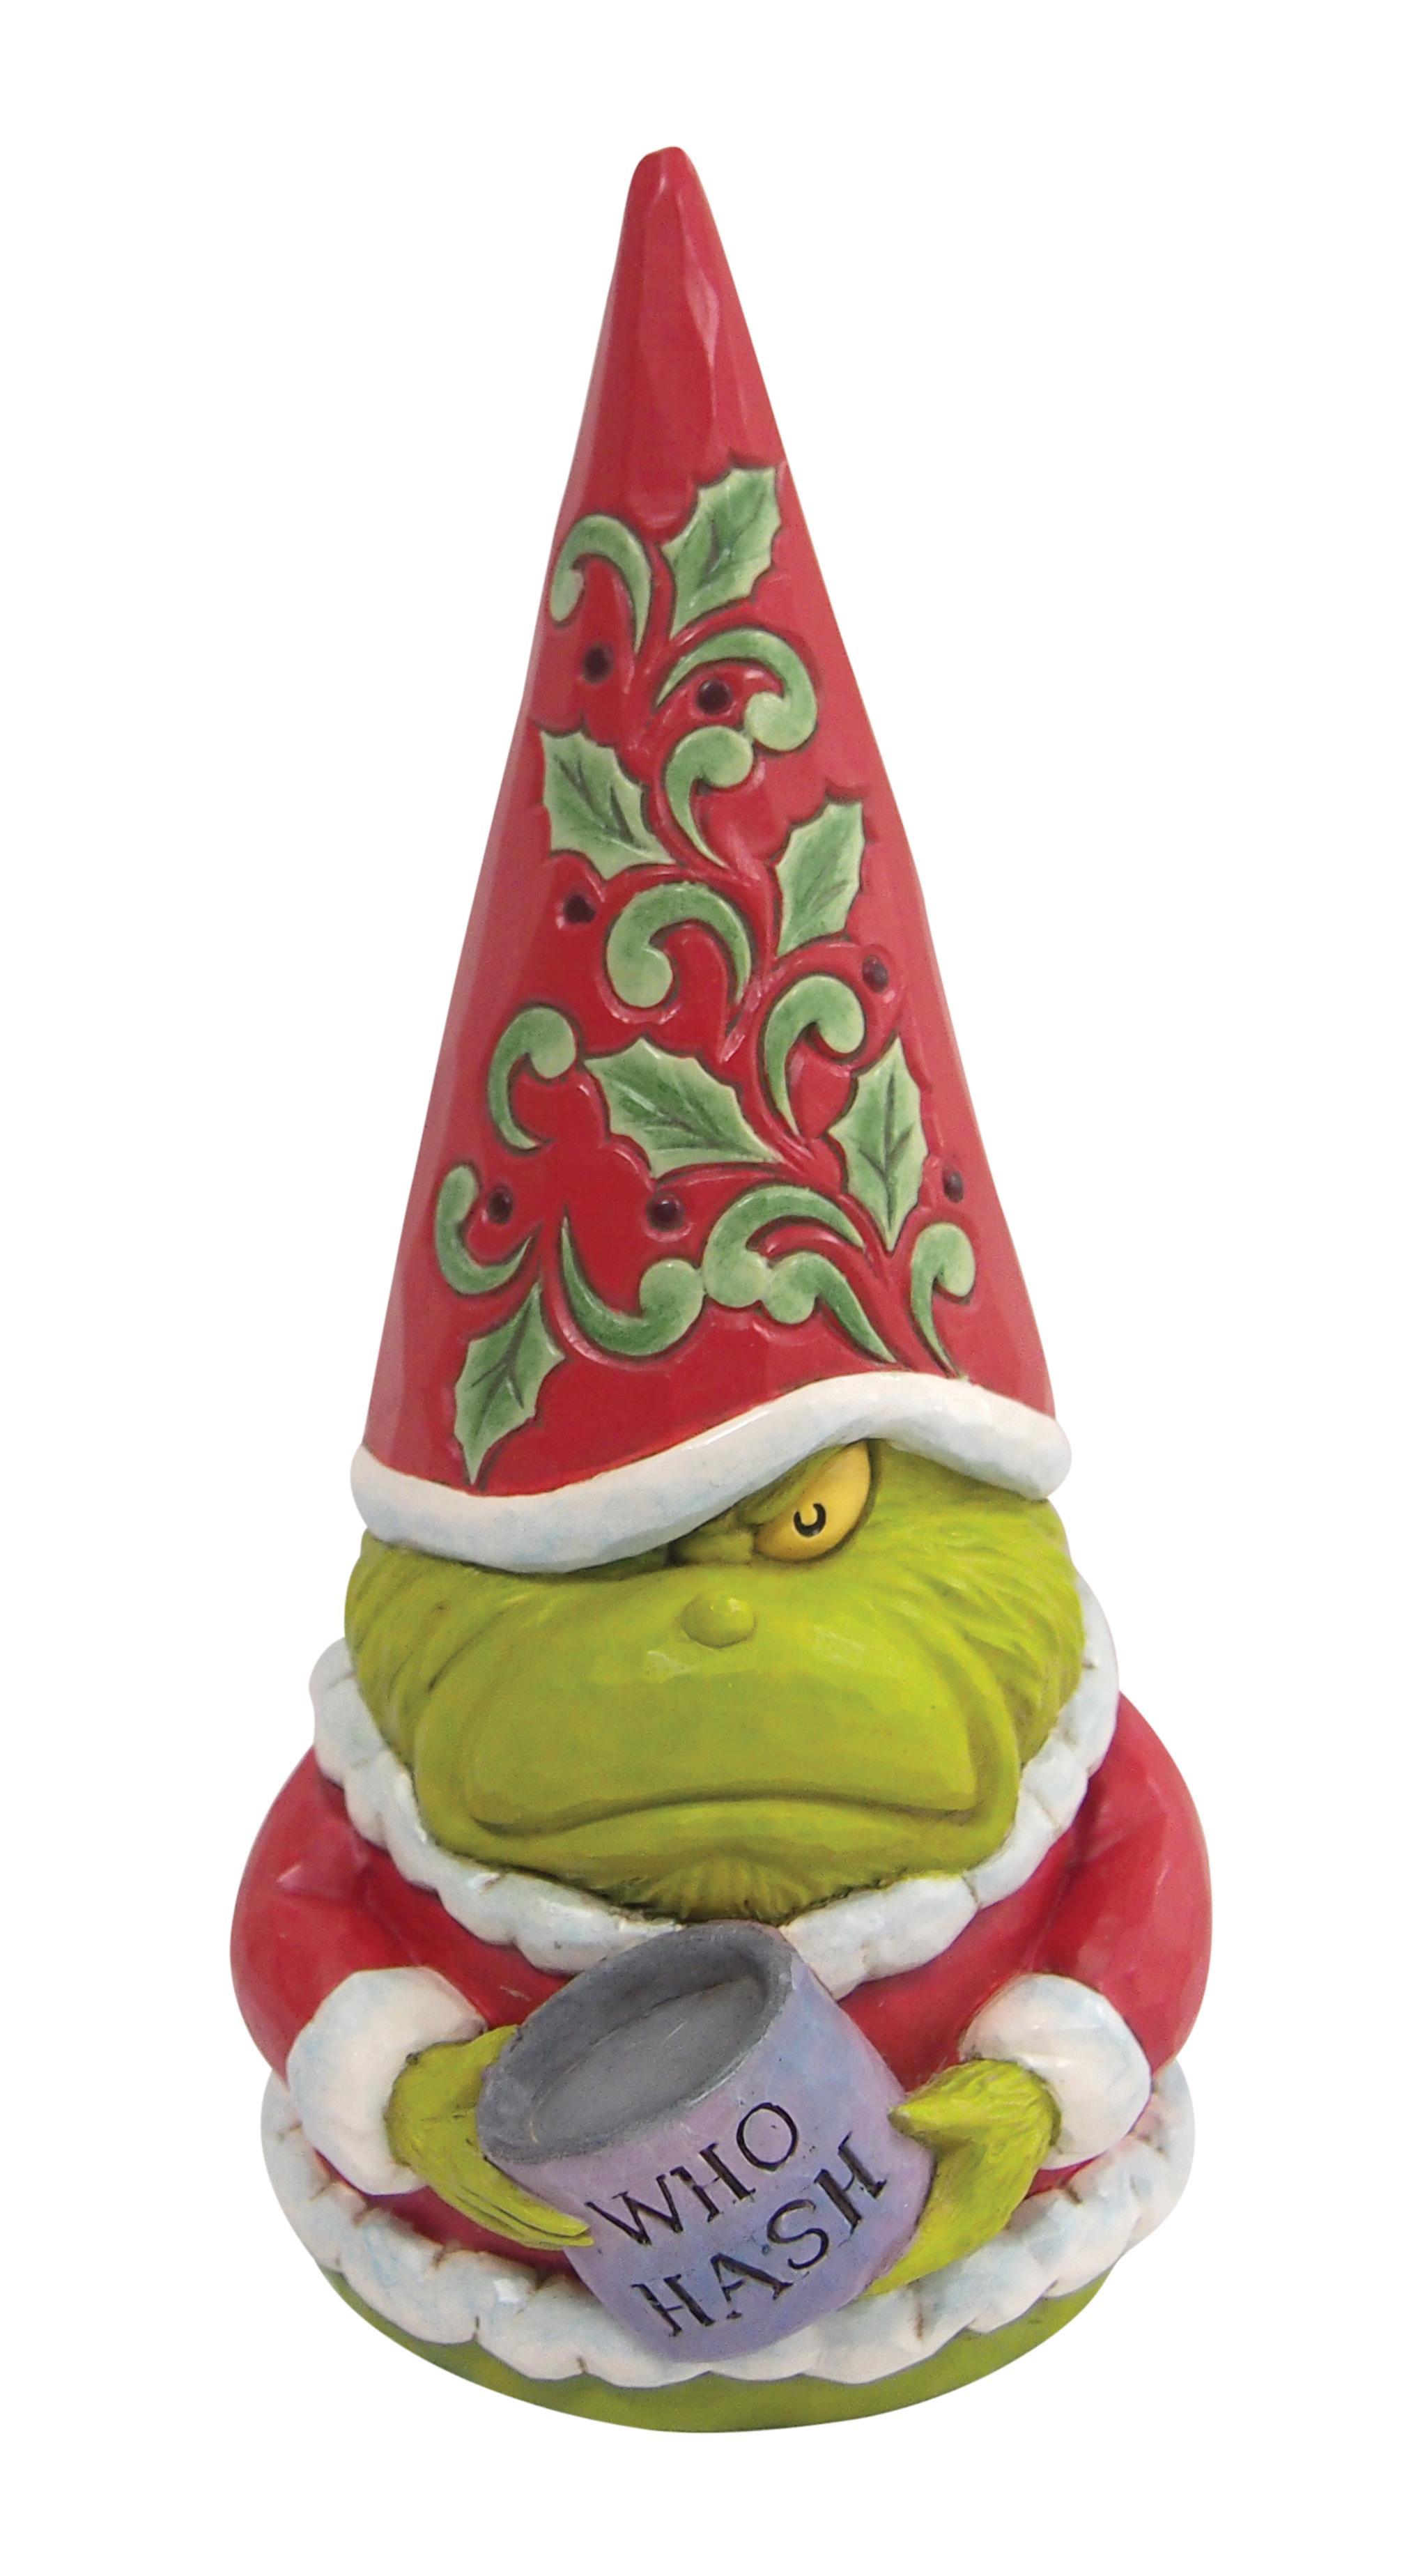 Jim Shore - Figurines 'Grinch Gnome 3 N' 2021